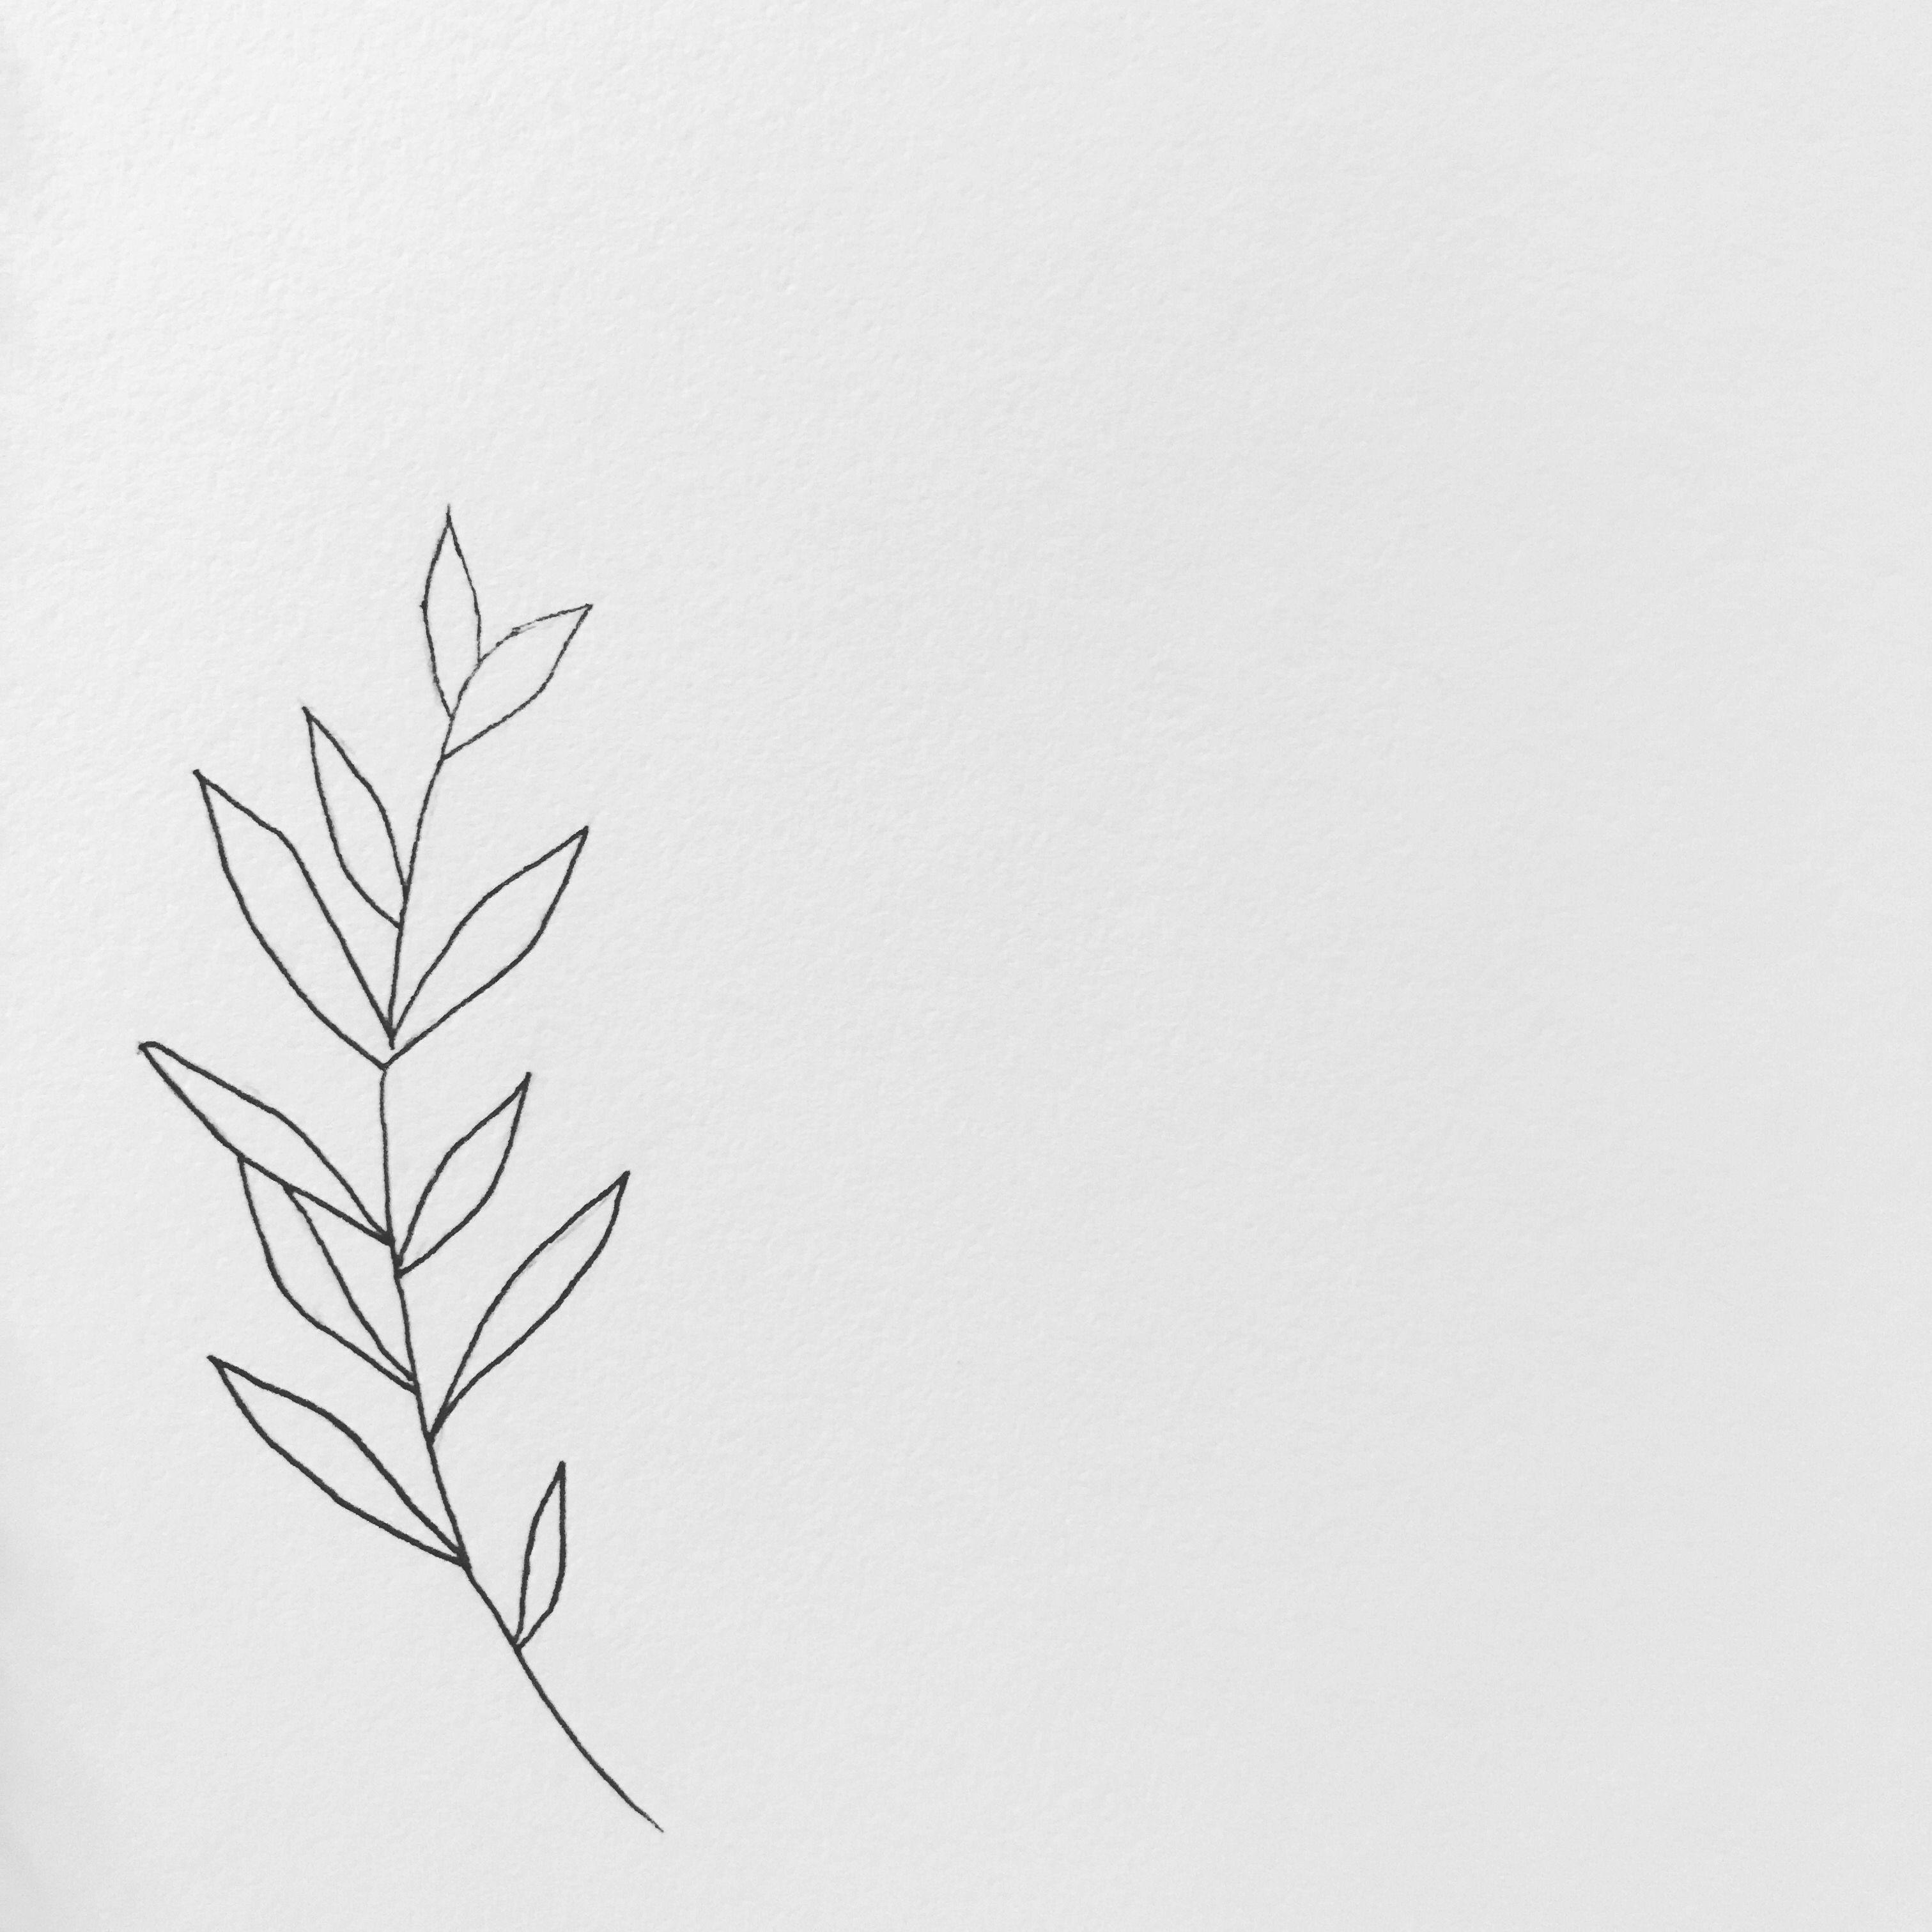 Minimalist Simple Leaf Tattoo: #minimalist #blackandwhite #pen #sketchbook #micronpen